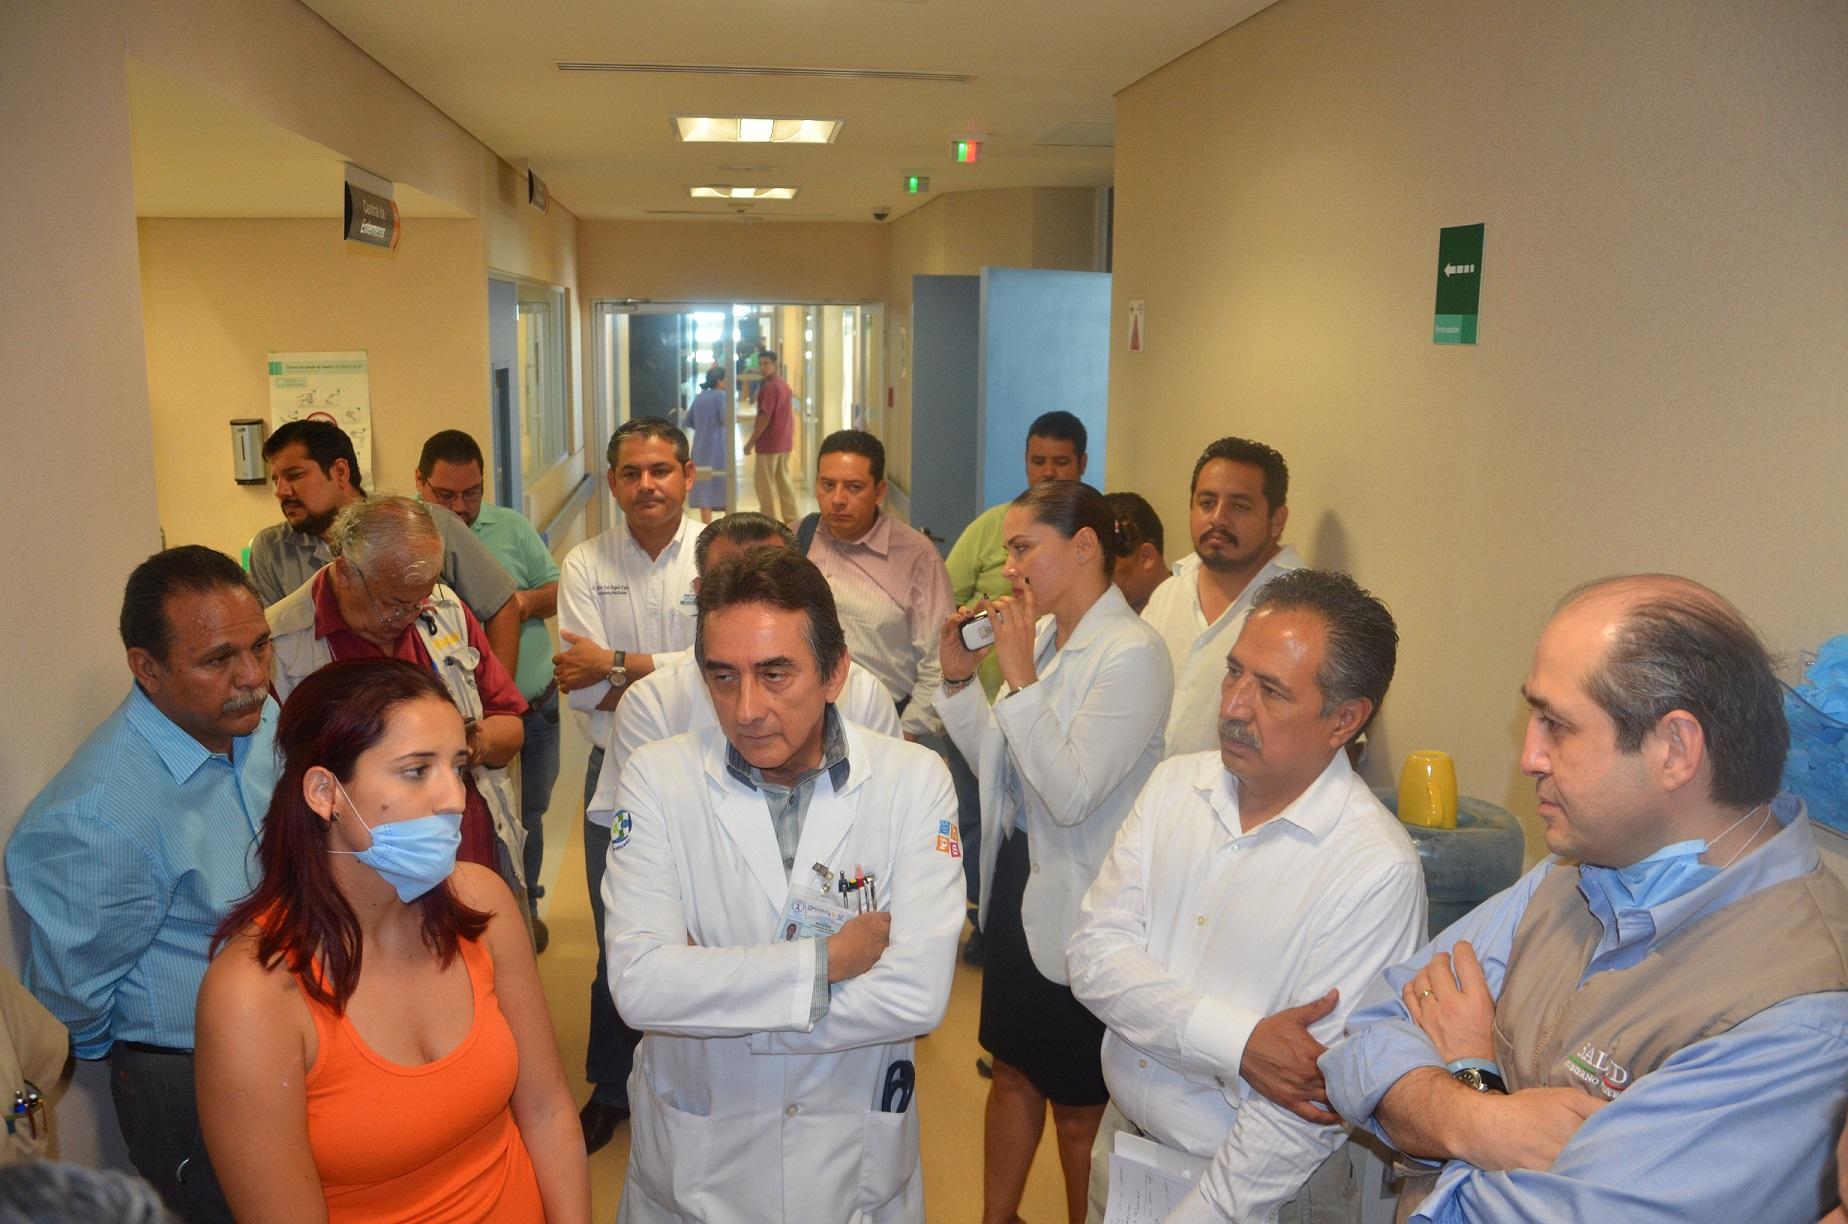 Se llevó a cabo la Reunión del Comité Interinstitucional del Sector Salud en La Paz, BCS